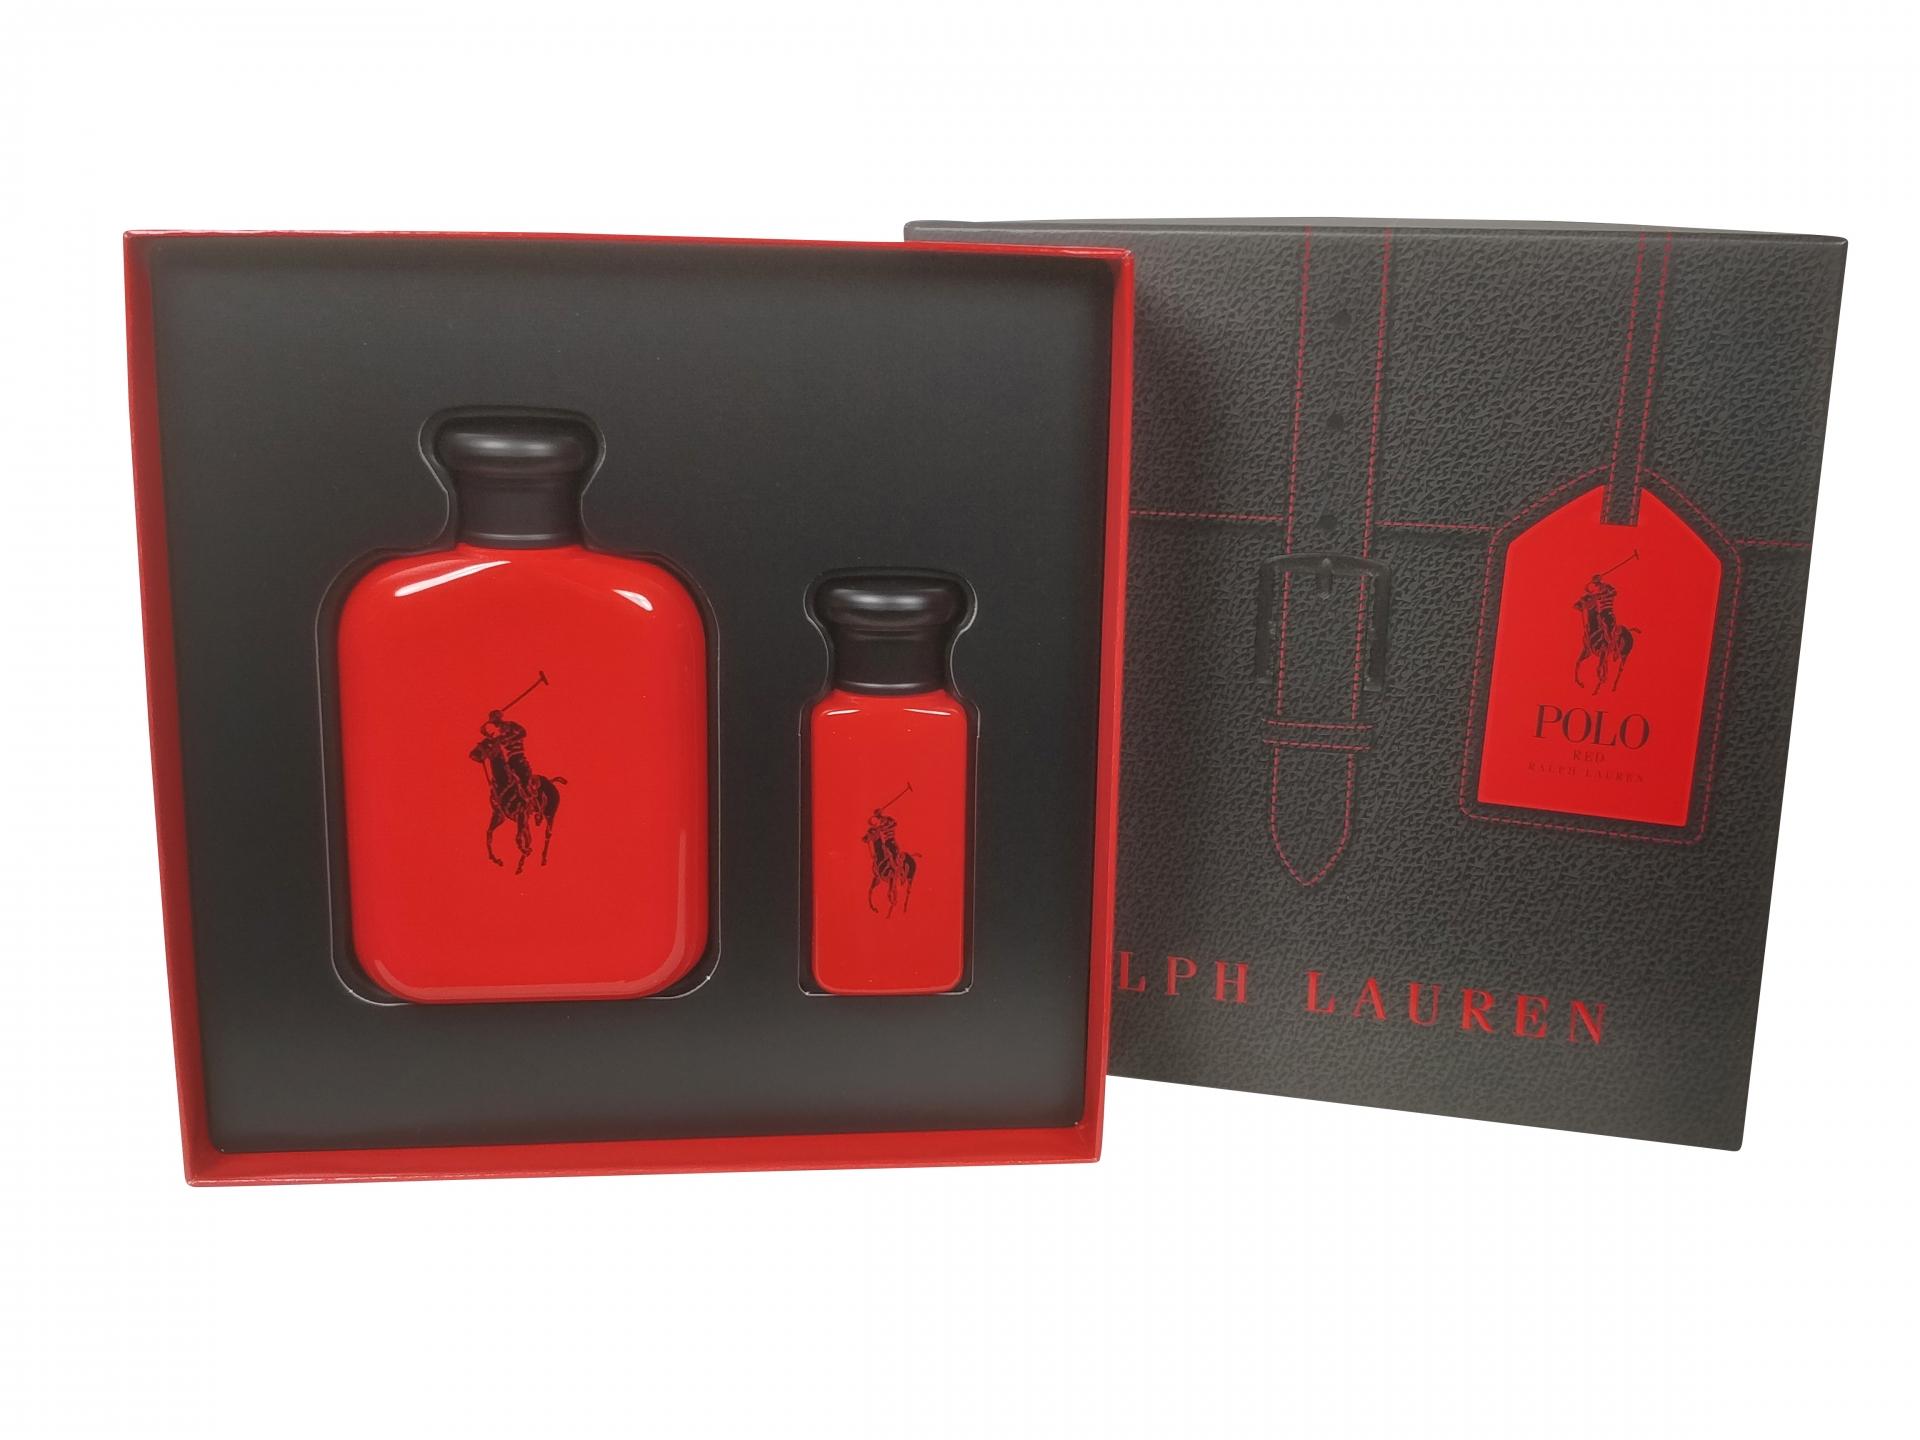 Image of Ralph Lauren - Polo Red 125ml Eau De Toilette + 30ml Eau De Toilette Eau De Toilette - Giftset